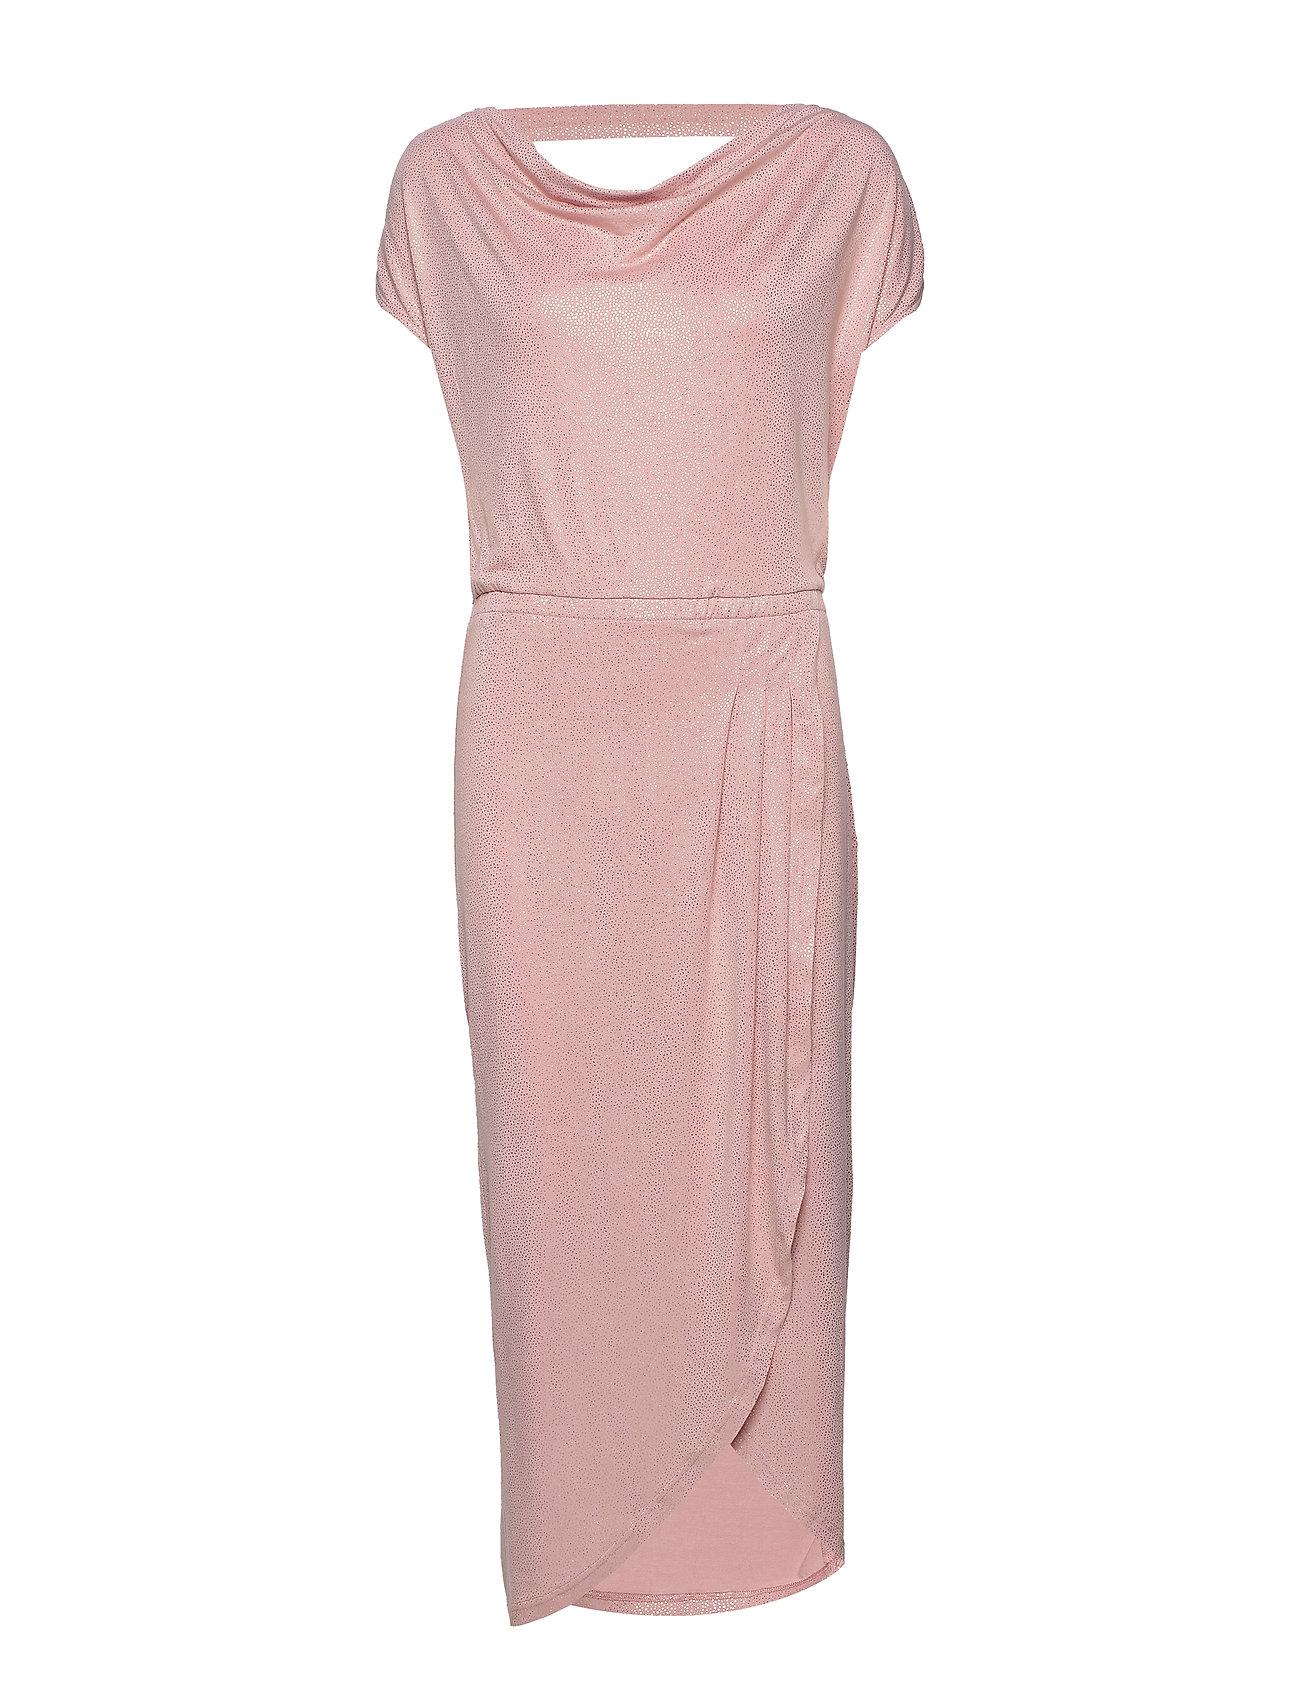 Rosemunde Dress ss - POWDER ROSE SHIMMERING DOTS